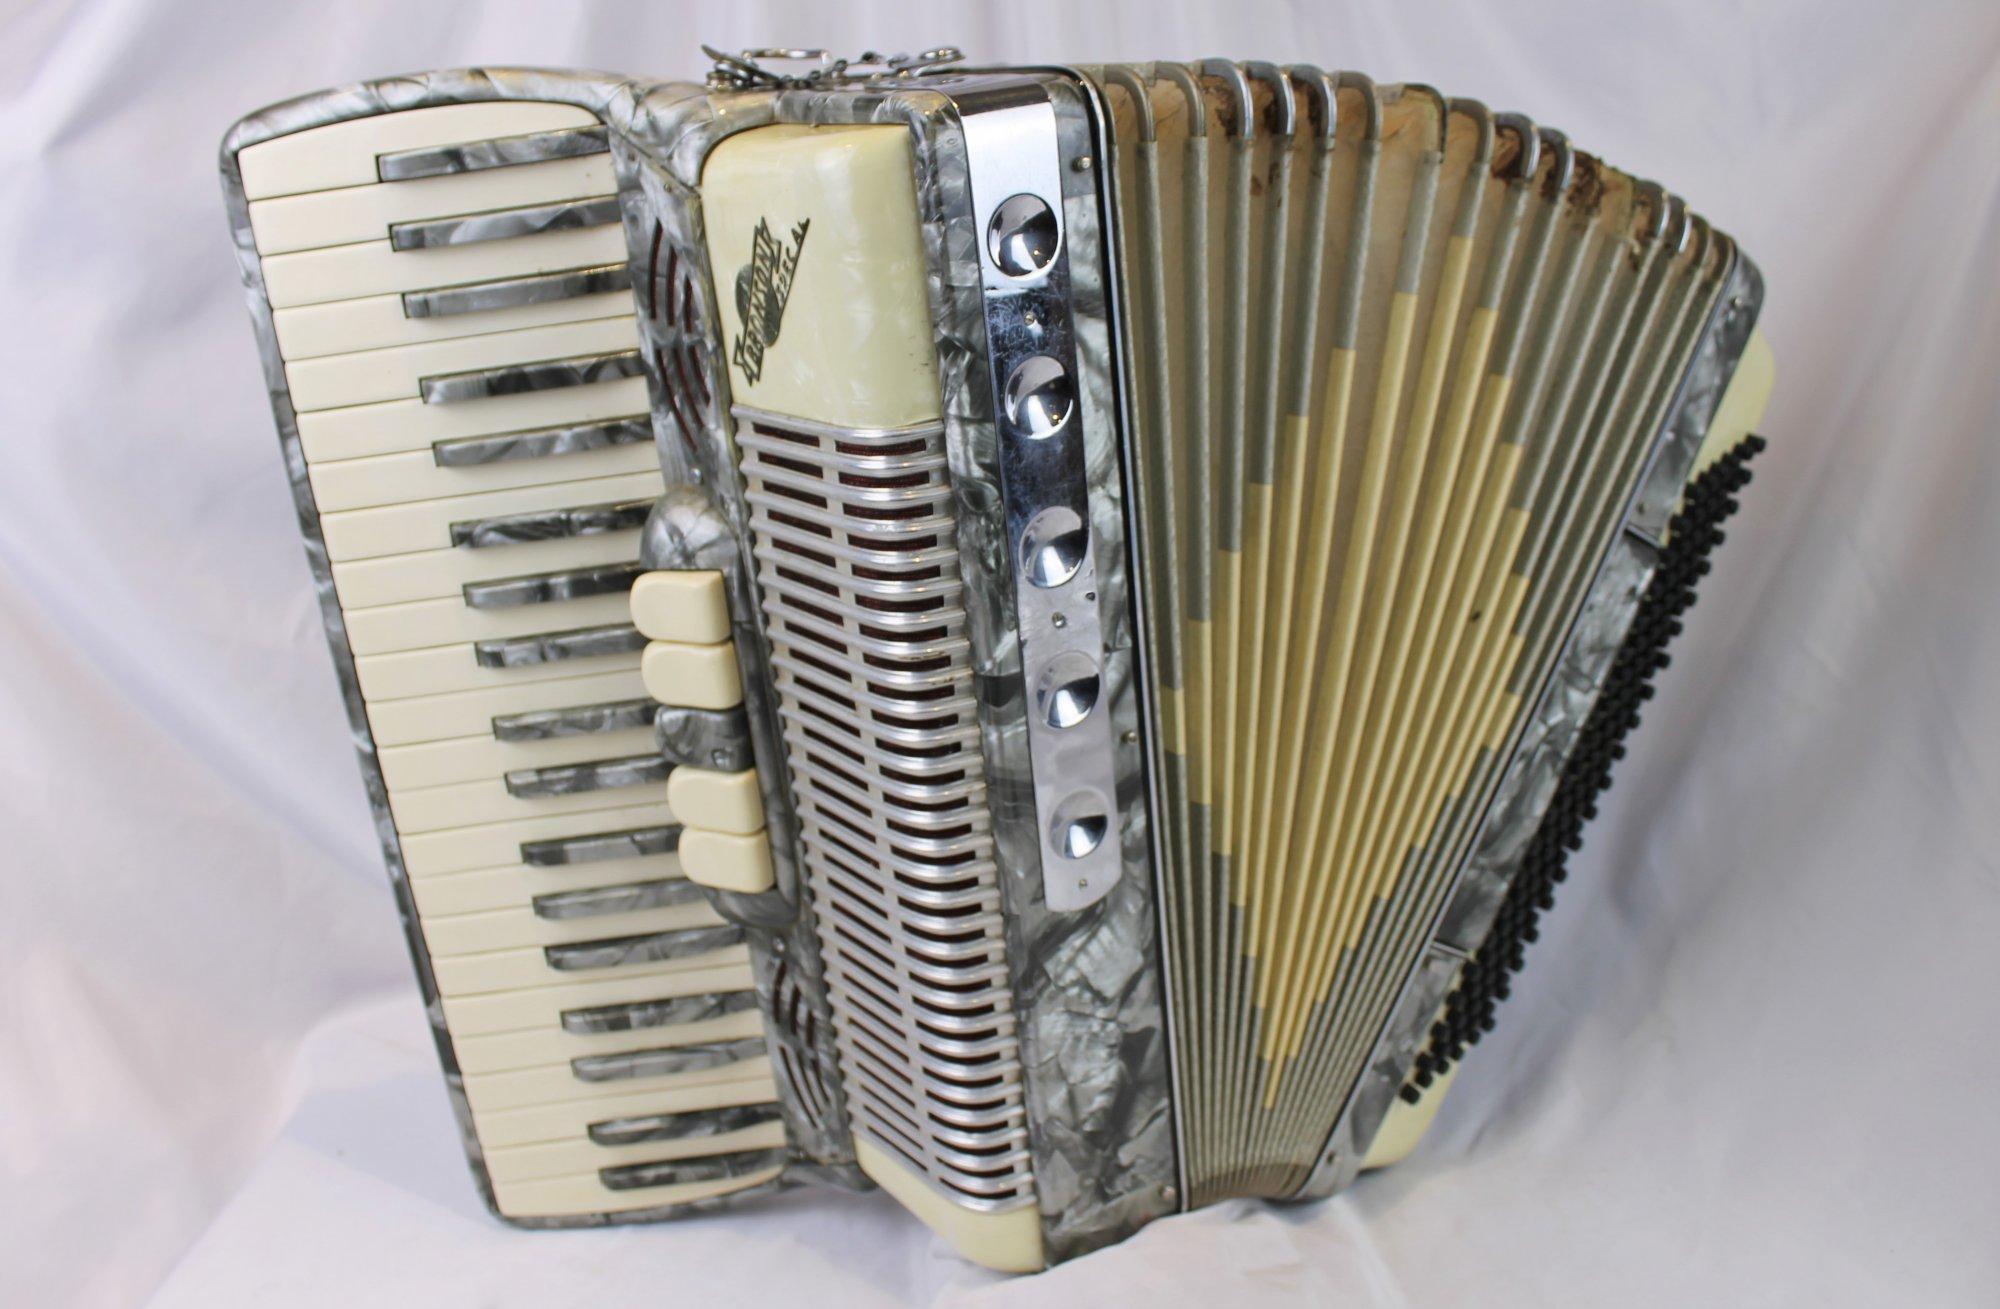 4577 - Silver Nobility Noble Bronson Special Piano Accordion LMM 41 120